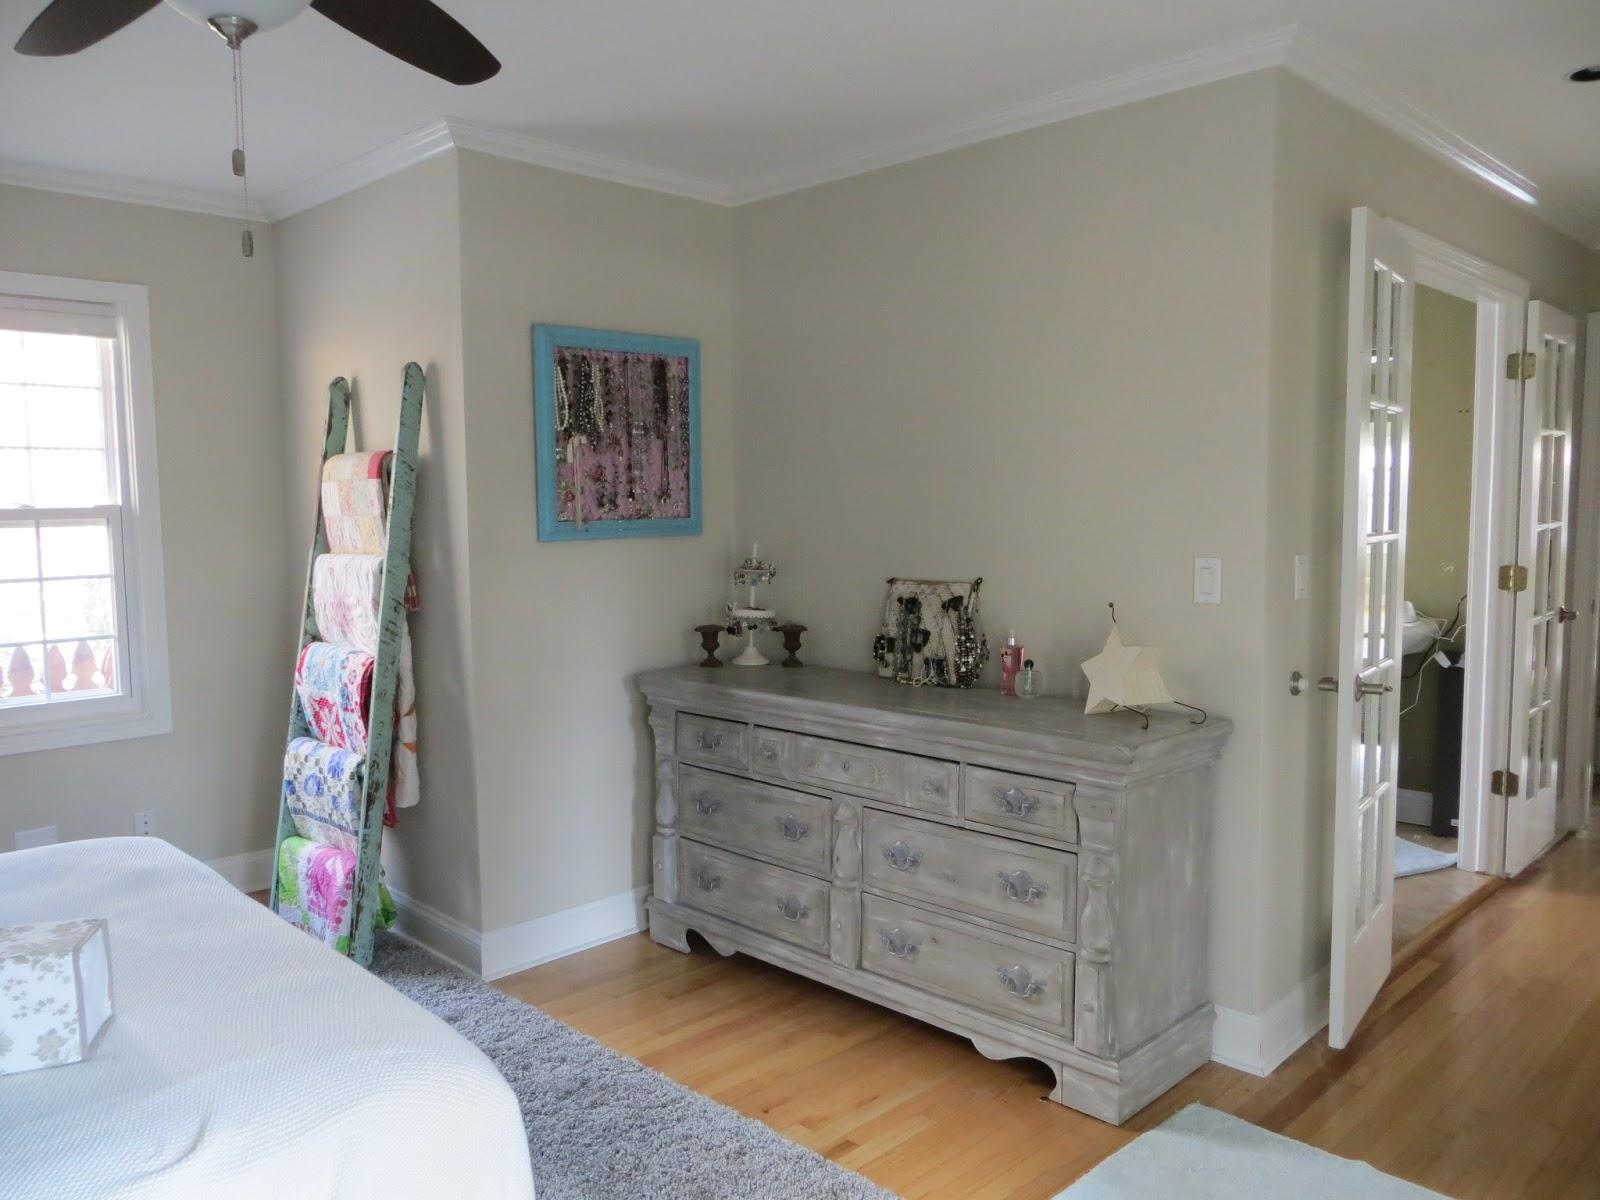 accio fabric the reveal part 2. Black Bedroom Furniture Sets. Home Design Ideas